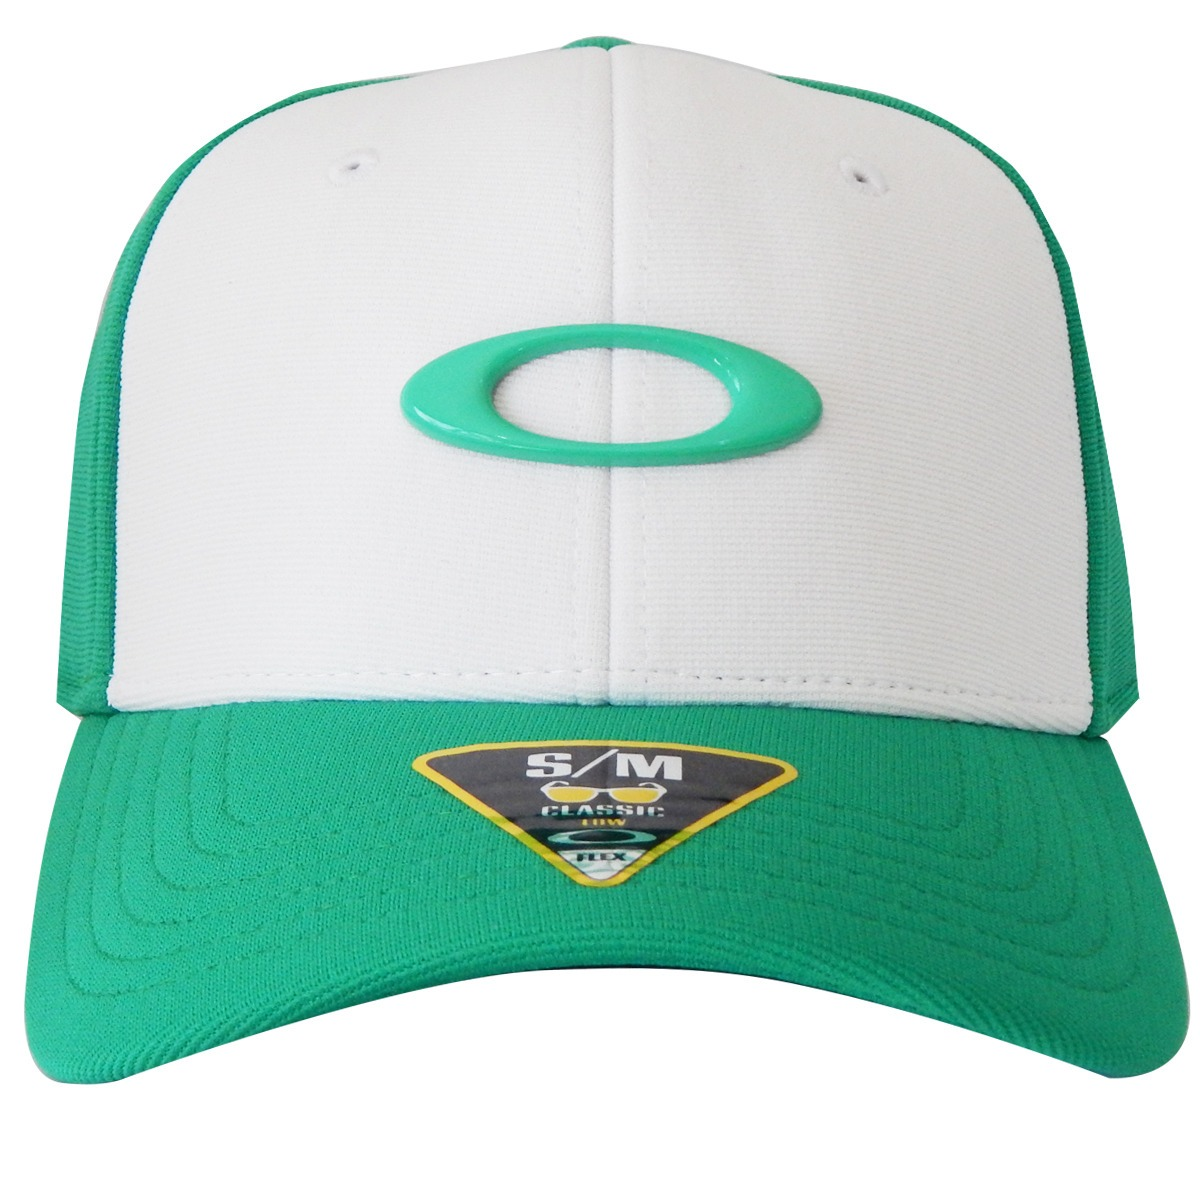 boné tincan oakley original verde branco. Carregando zoom. 1a407a5bc1c